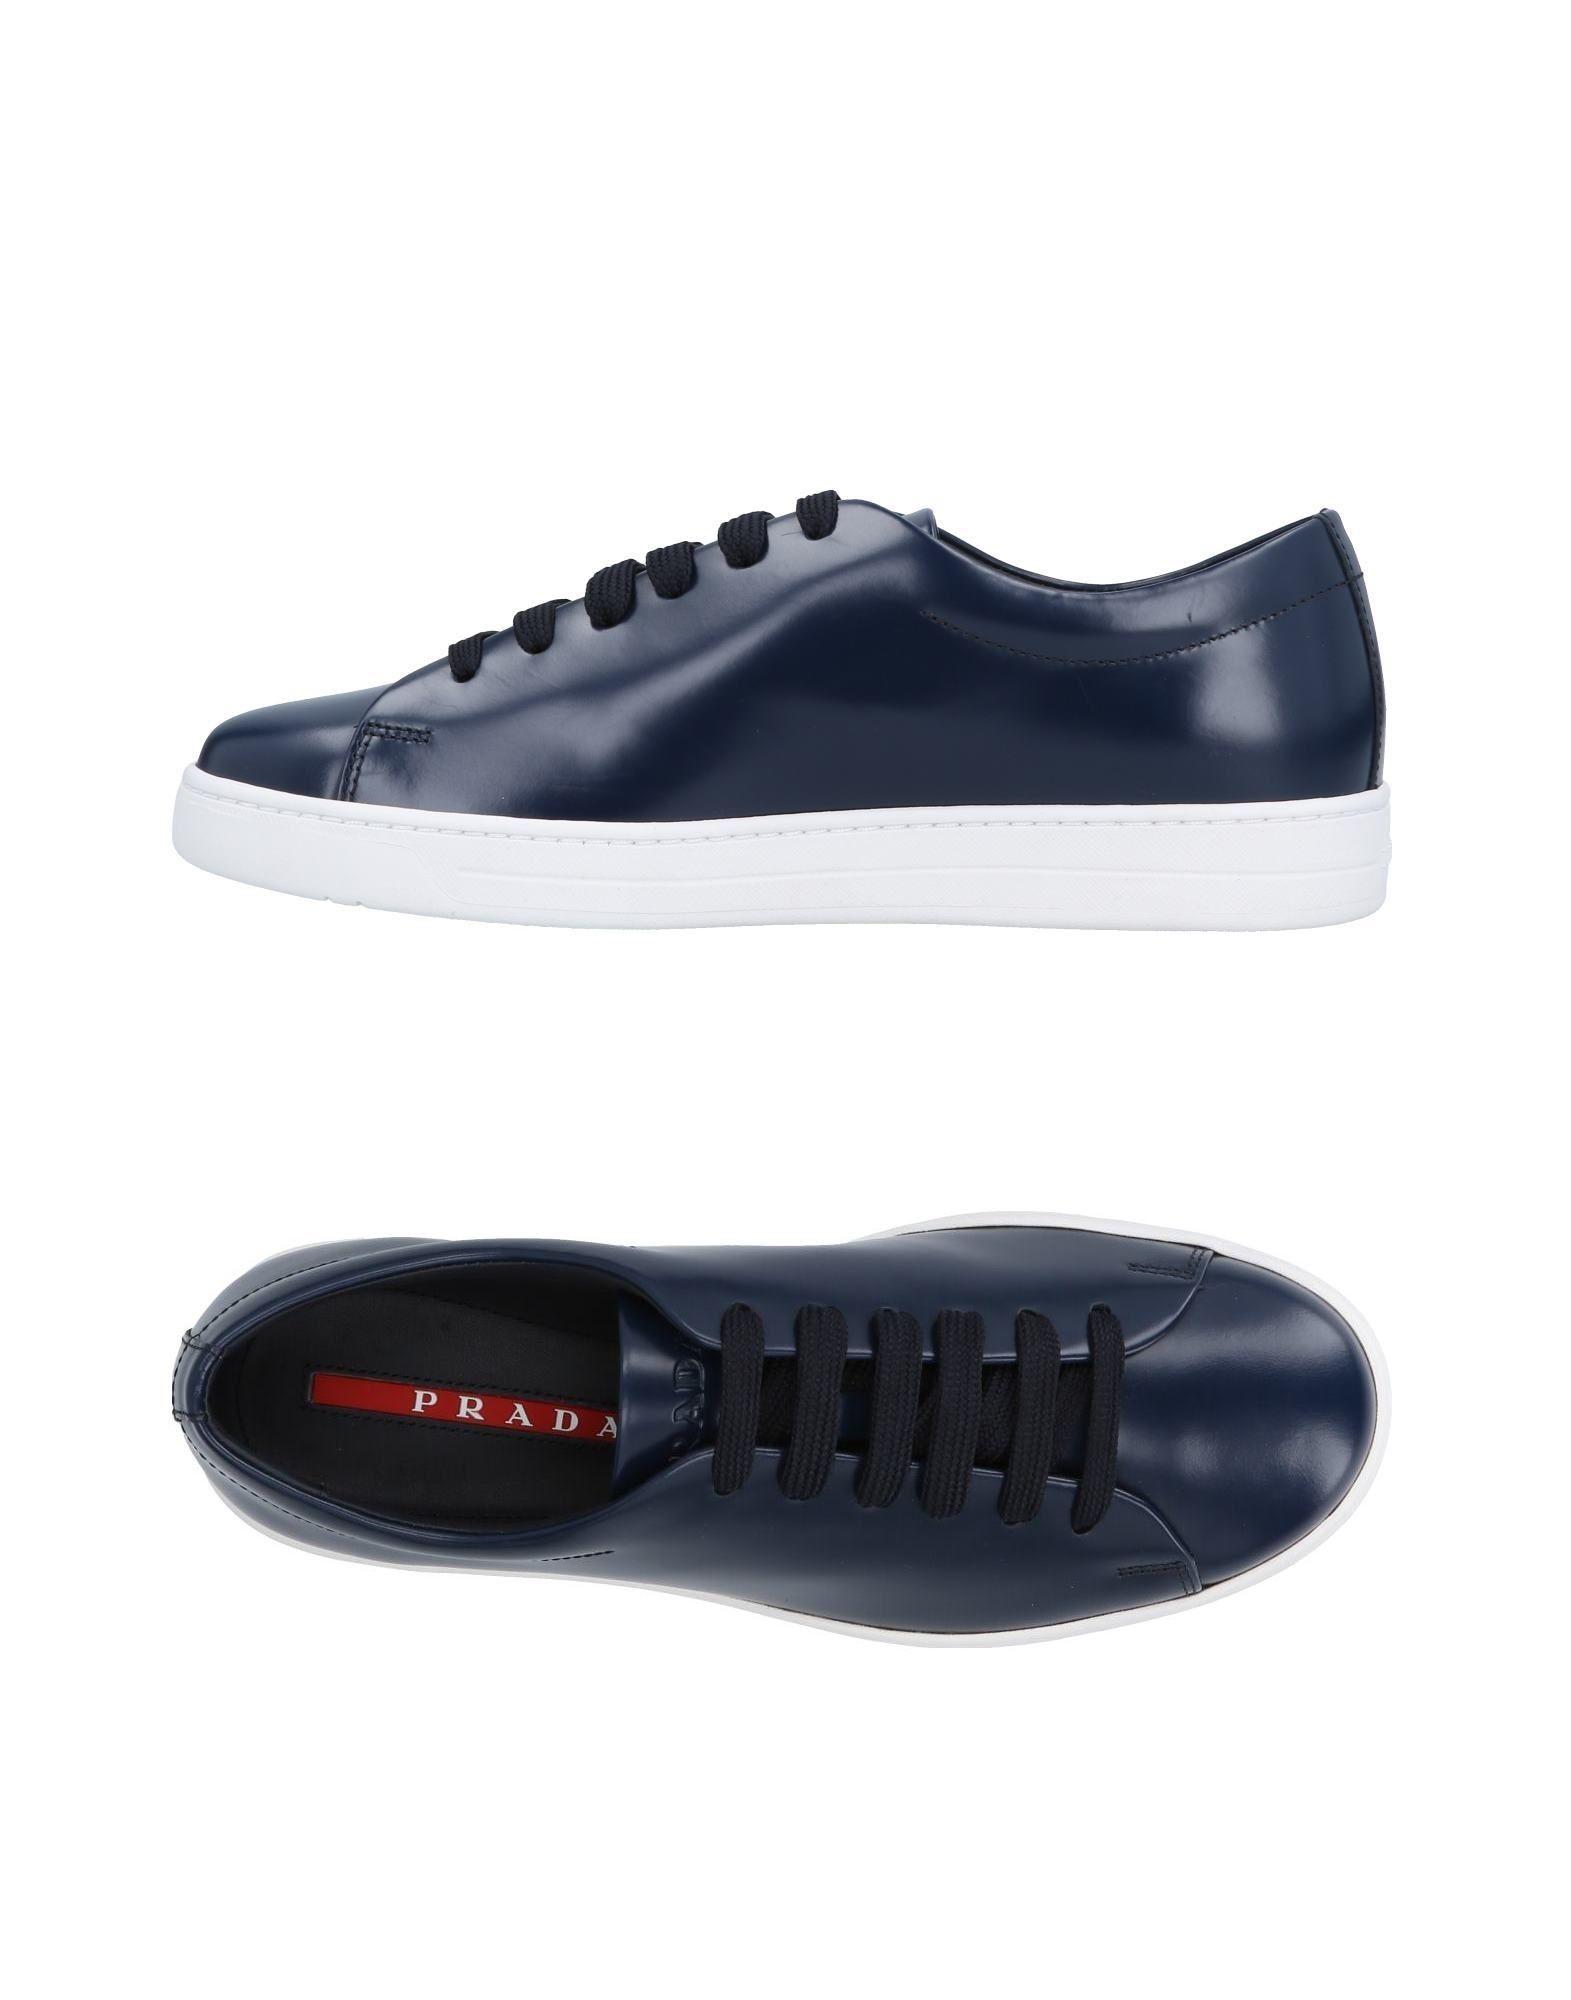 Prada Sport Sneakers Herren beliebte  11255284HC Gute Qualität beliebte Herren Schuhe f5fee0